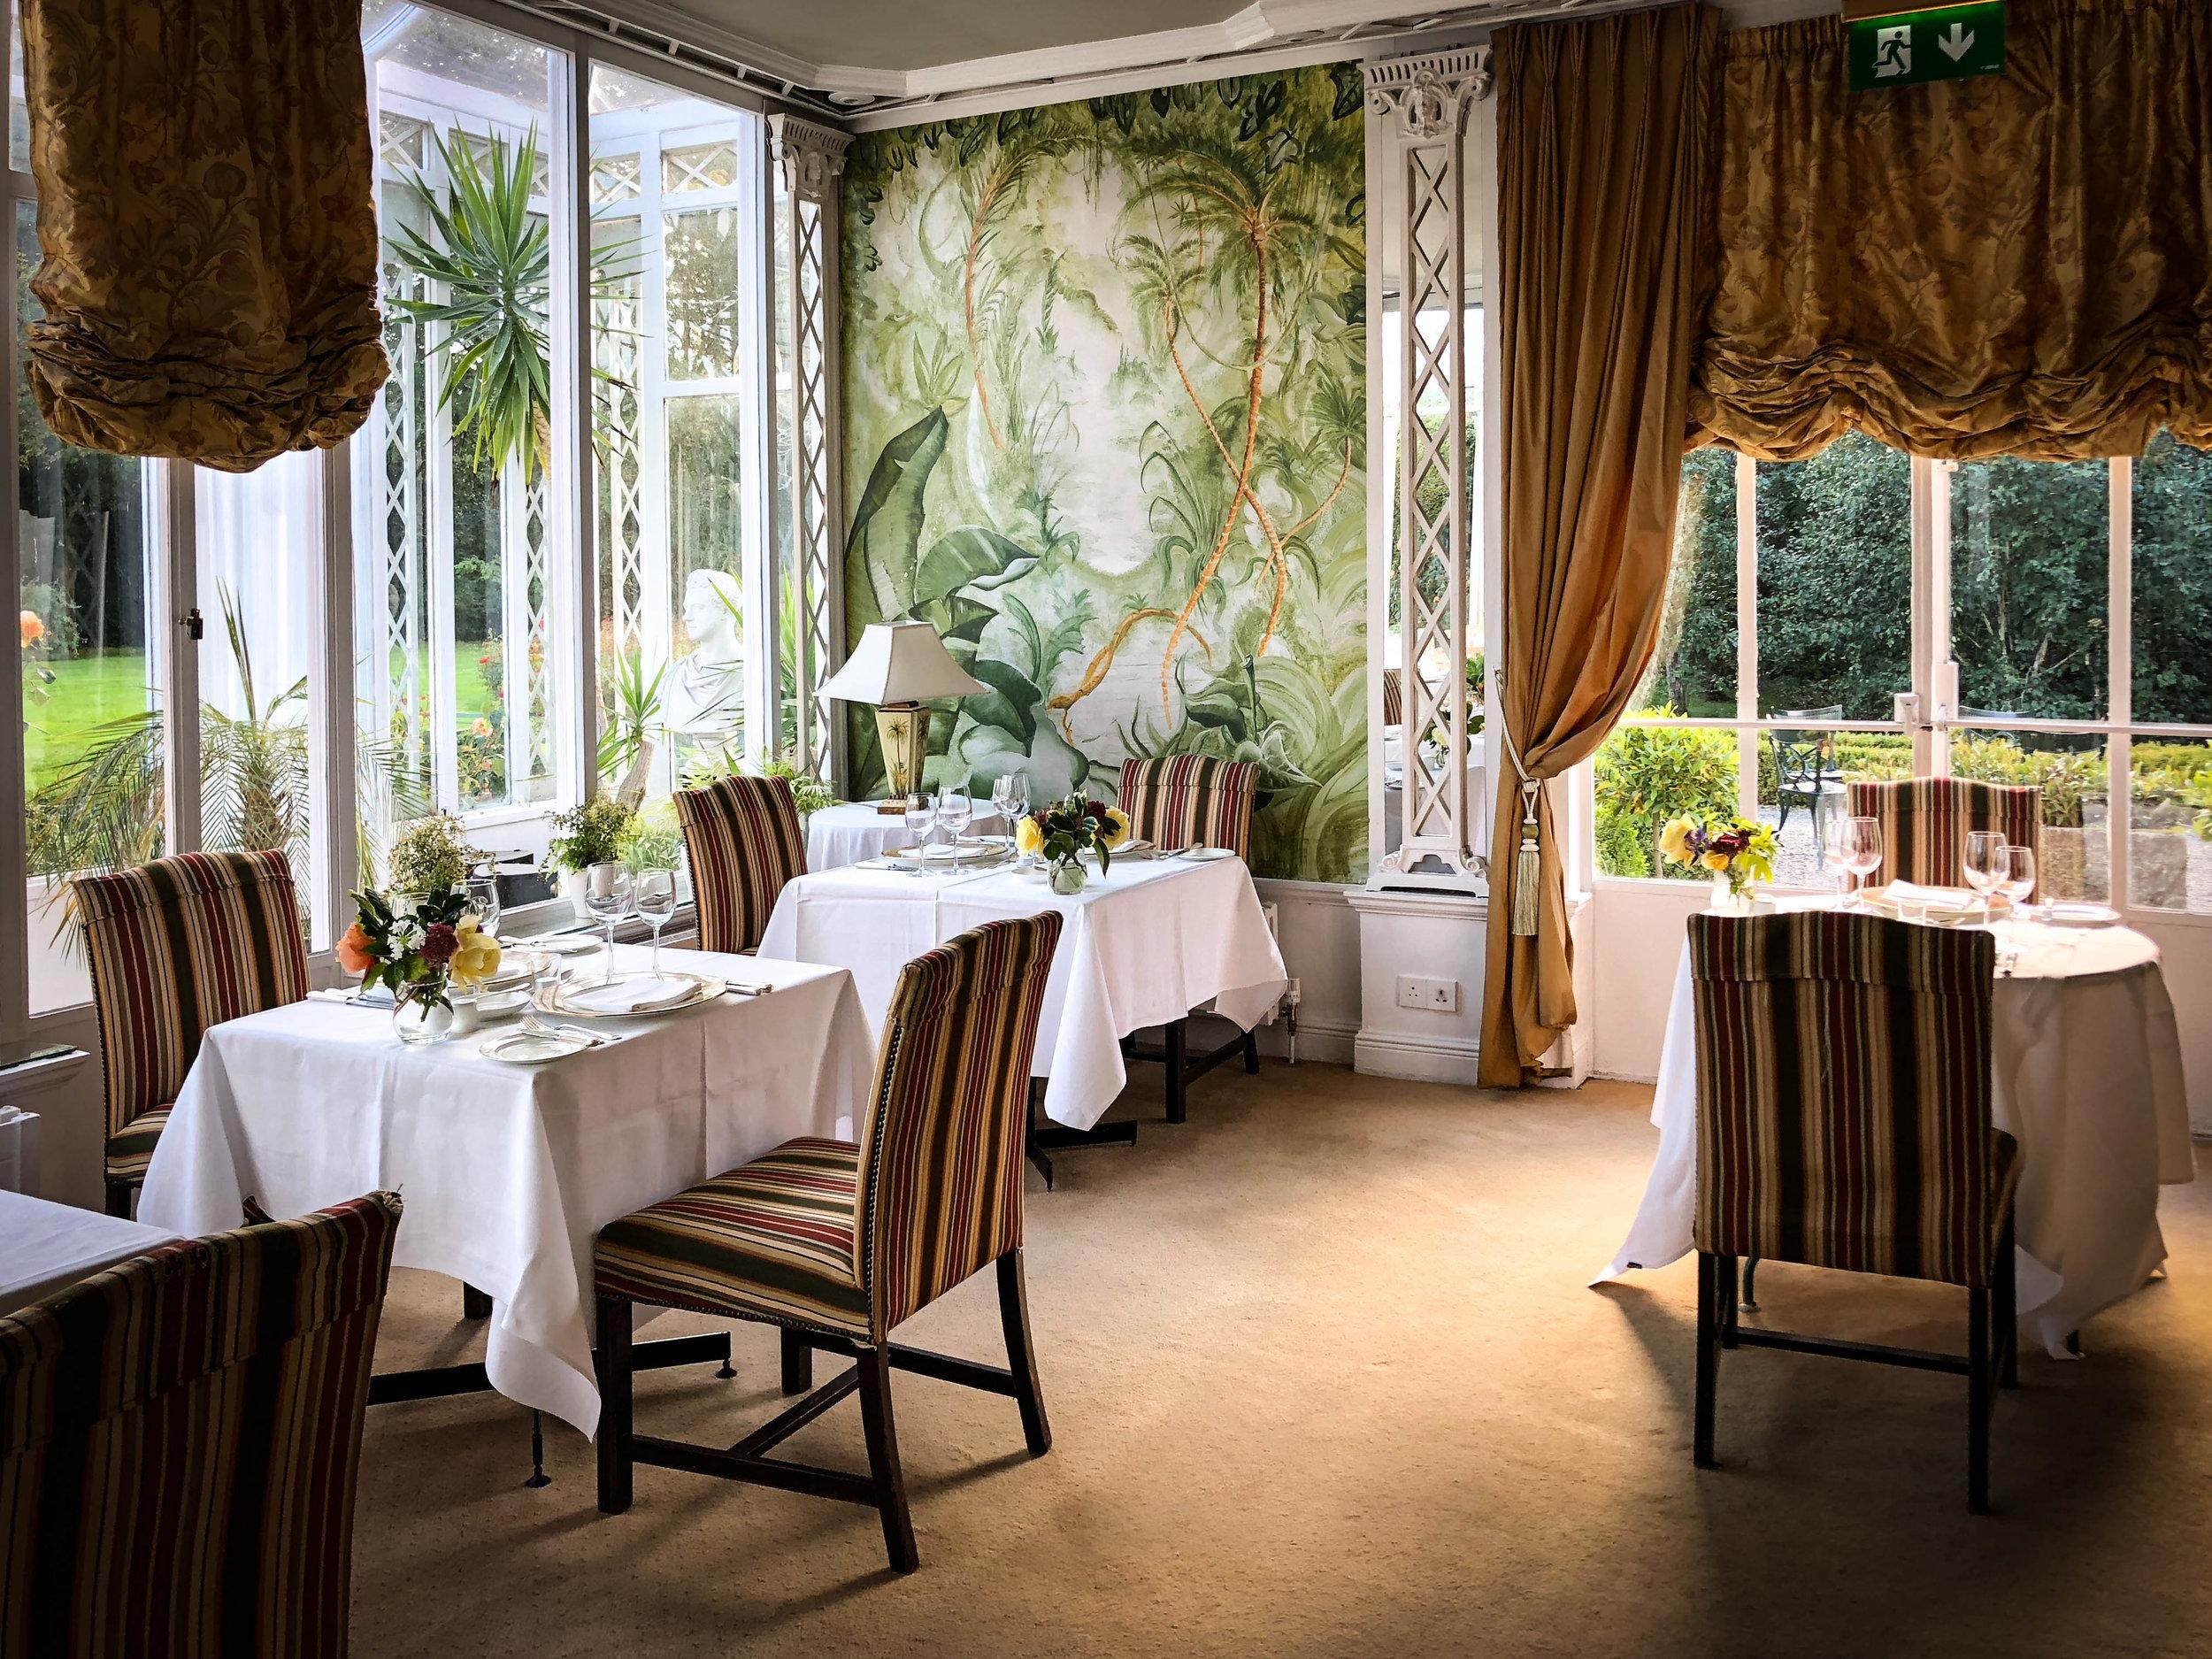 Marfield_House_Restaurant_Weston_Table.jpg